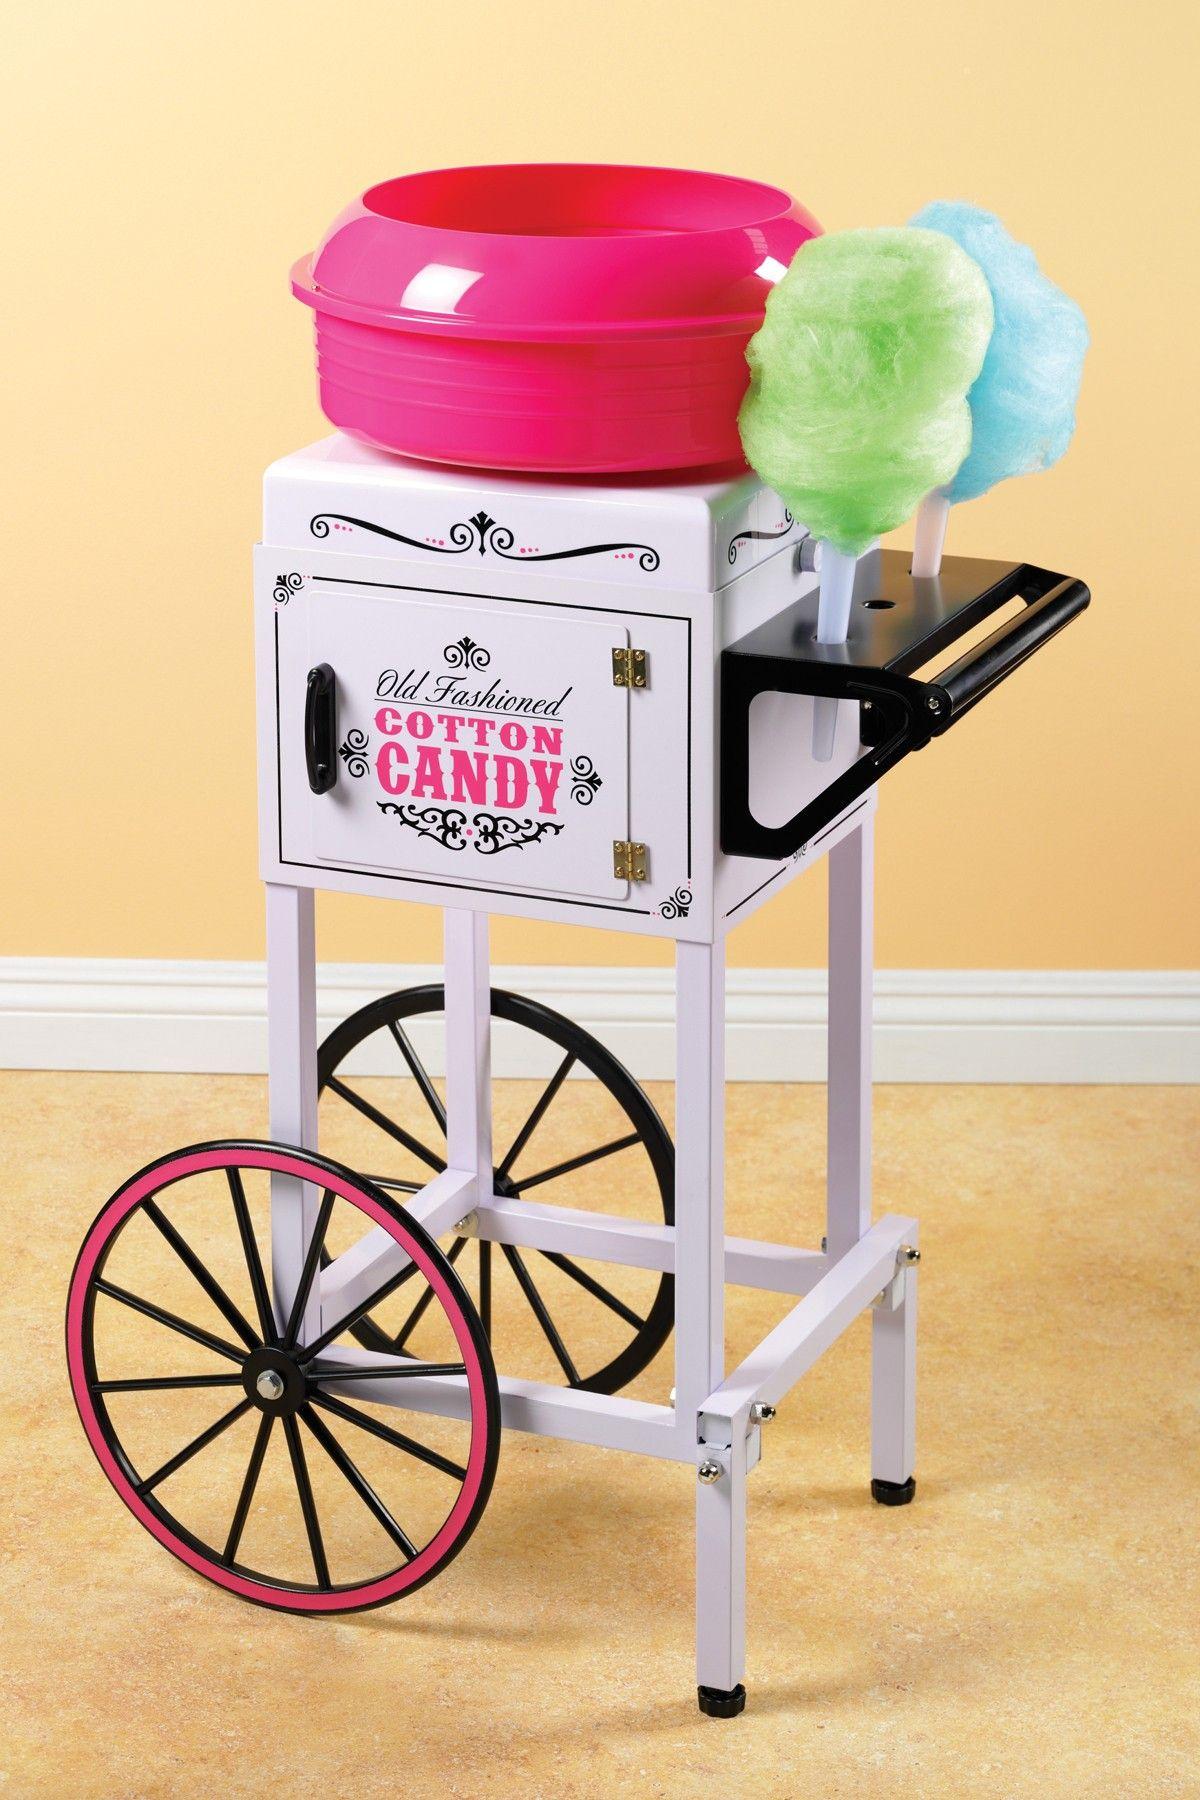 Cotton candy cart candy pinterest candy cart cotton candy